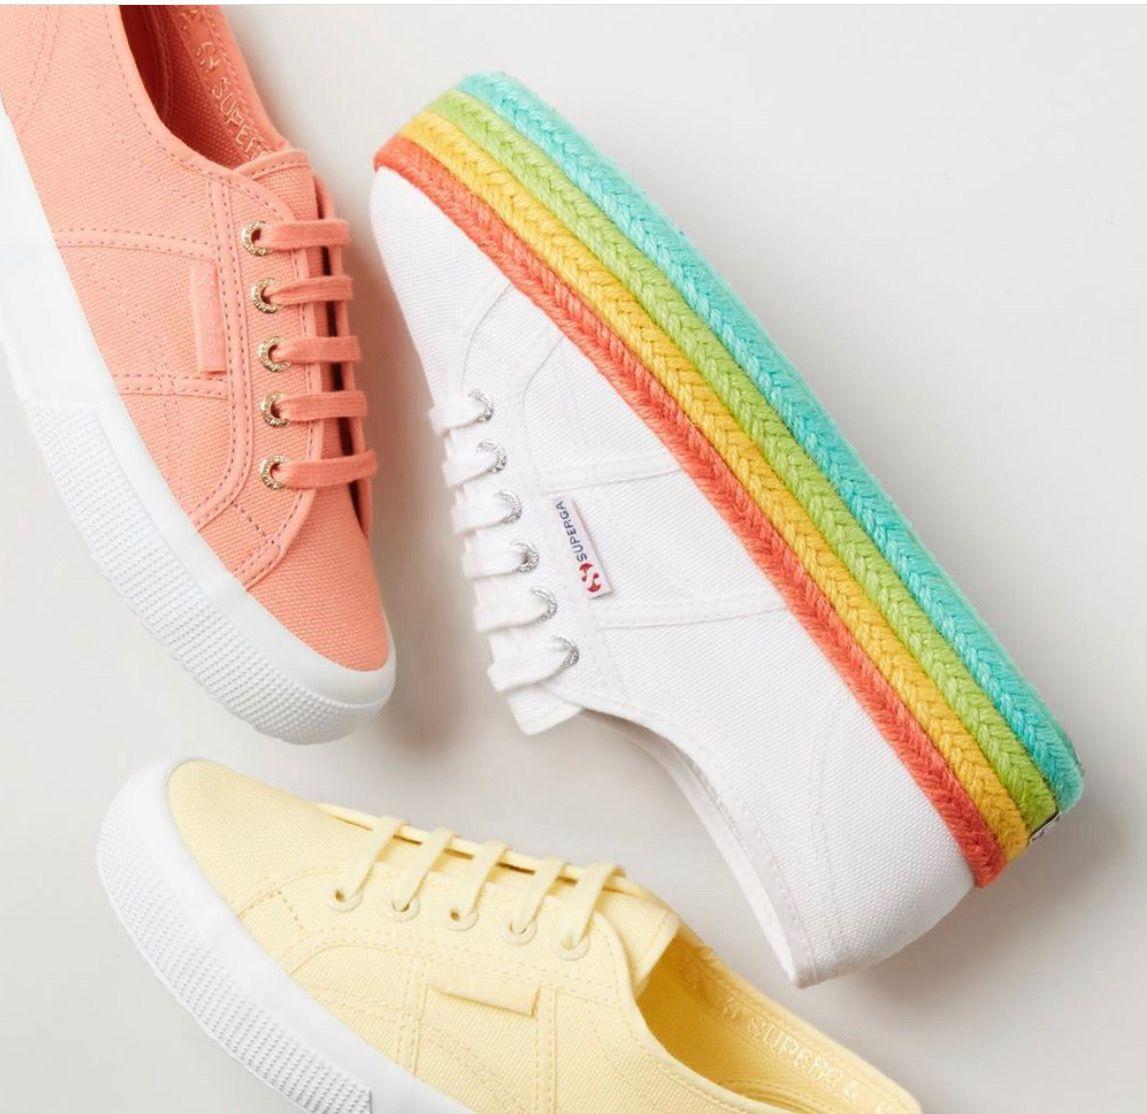 Superga, Sneakers fashion, Aventura mall